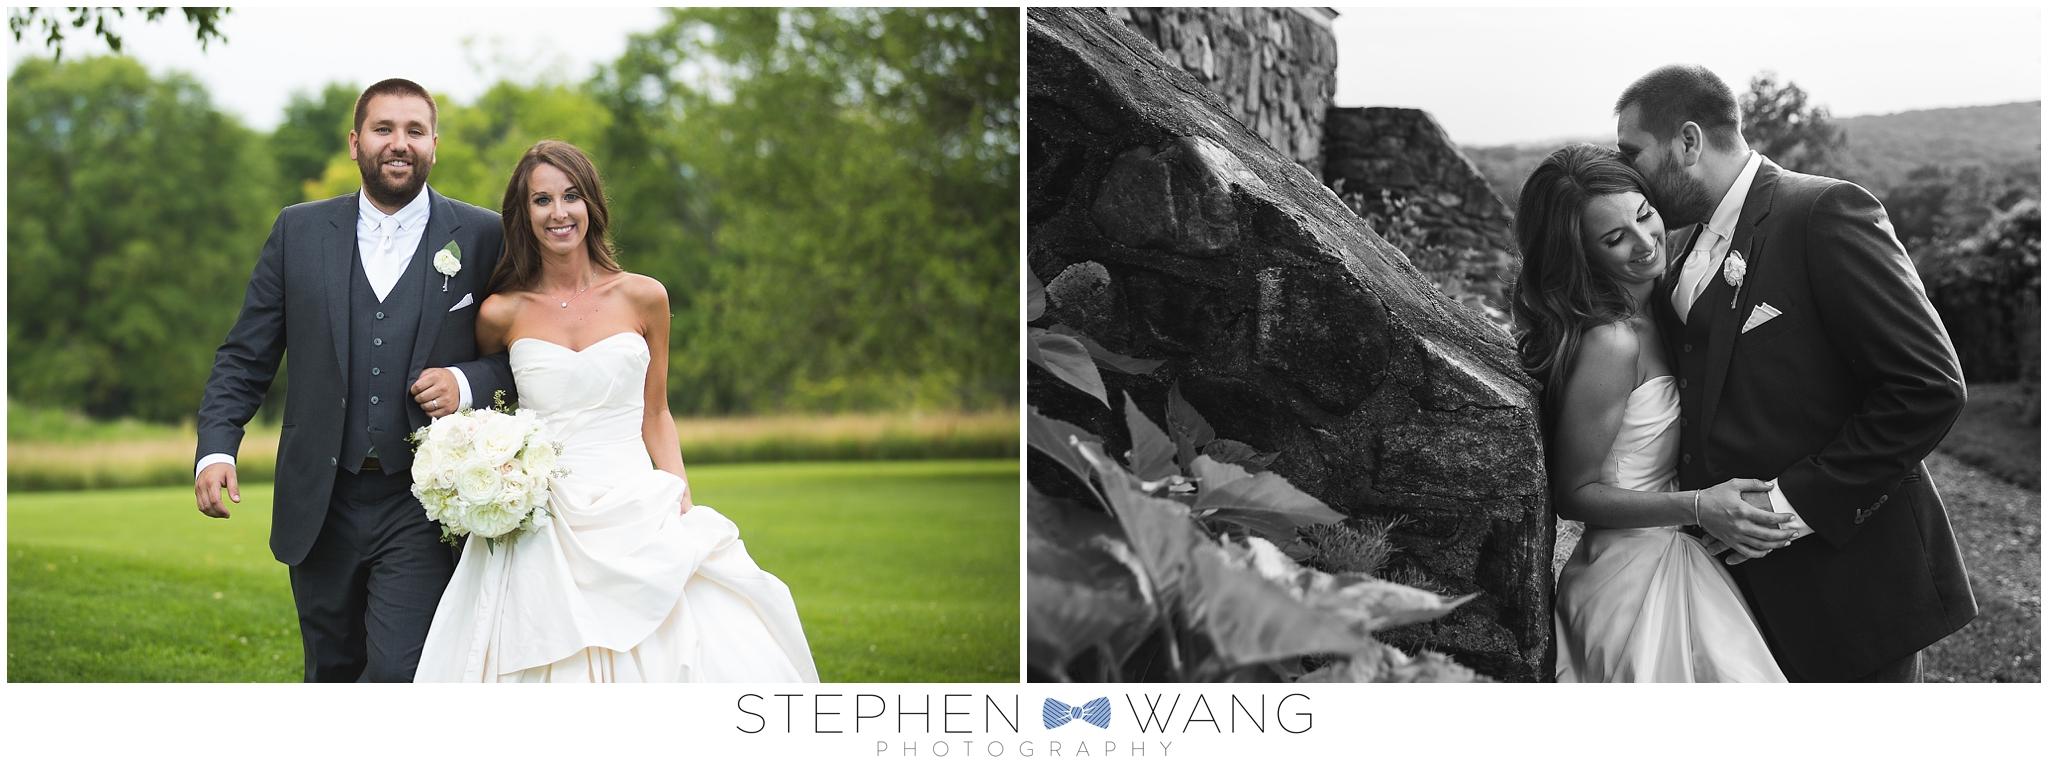 Stephen Wang Photography Wedding Photographer Connecticut CT-12-24_0004.jpg